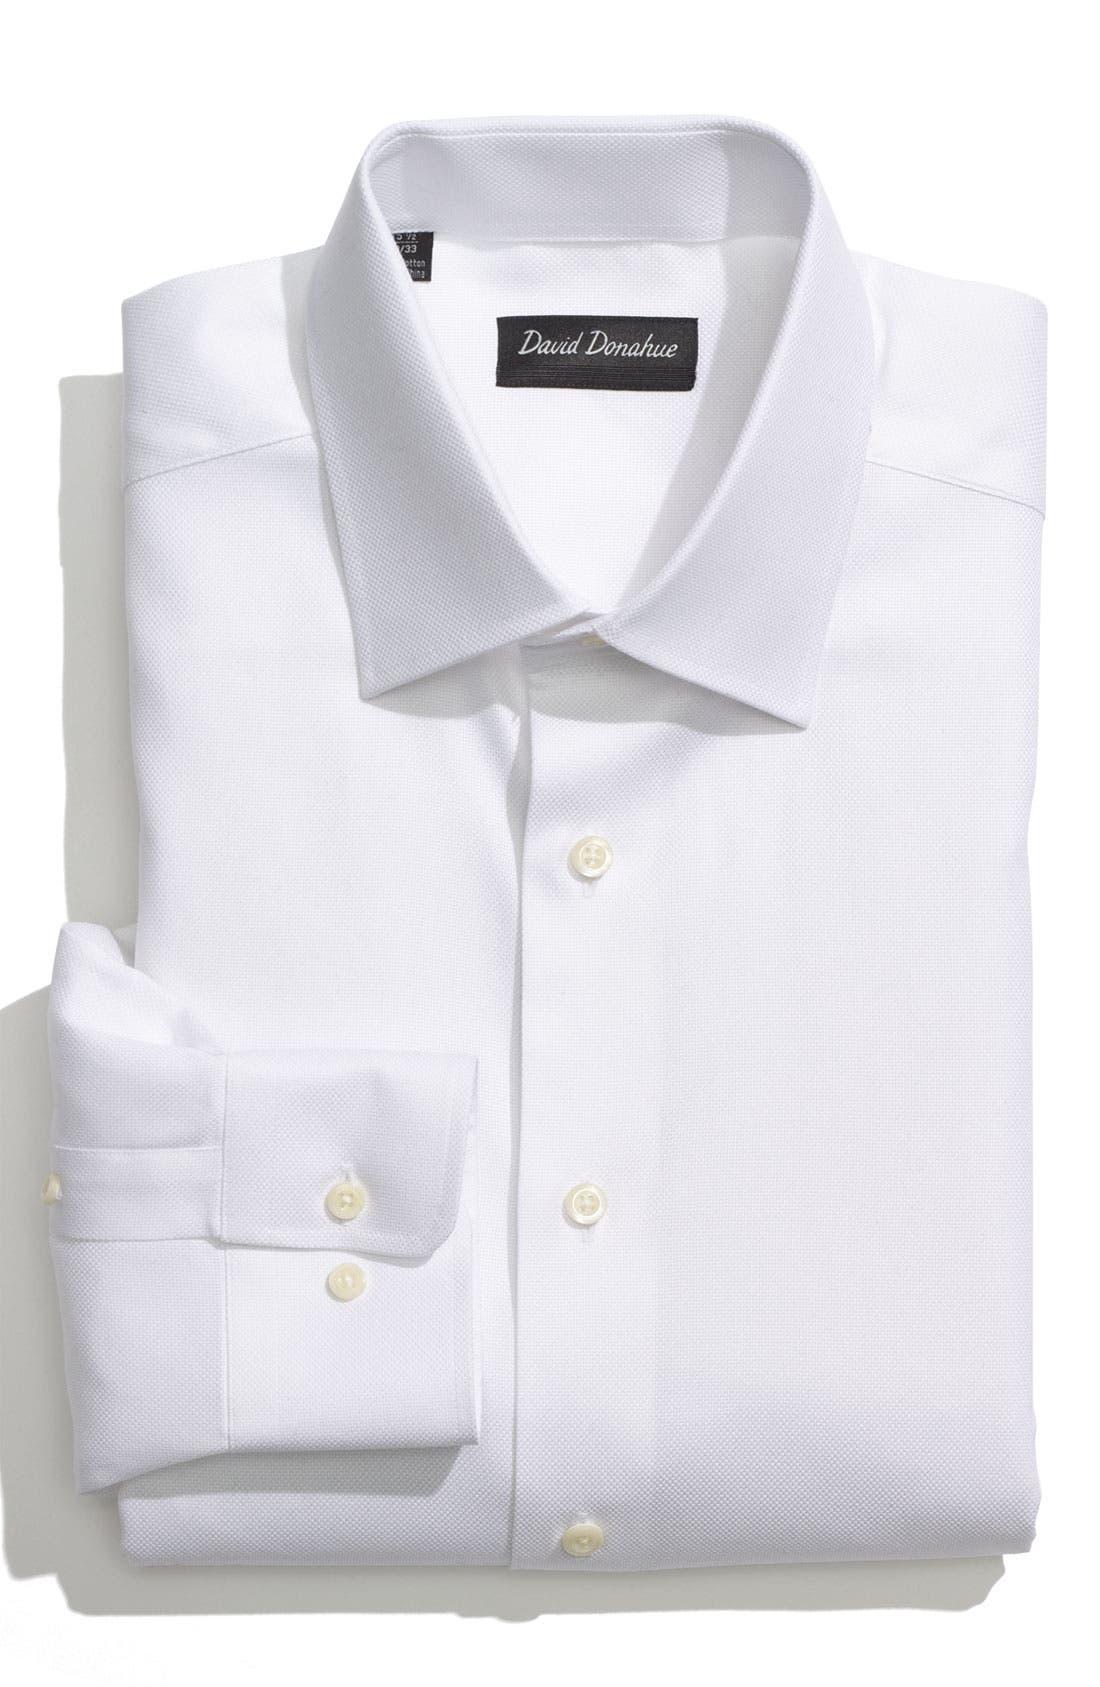 DAVID DONAHUE, Regular Fit Oxford Dress Shirt, Main thumbnail 1, color, WHITE